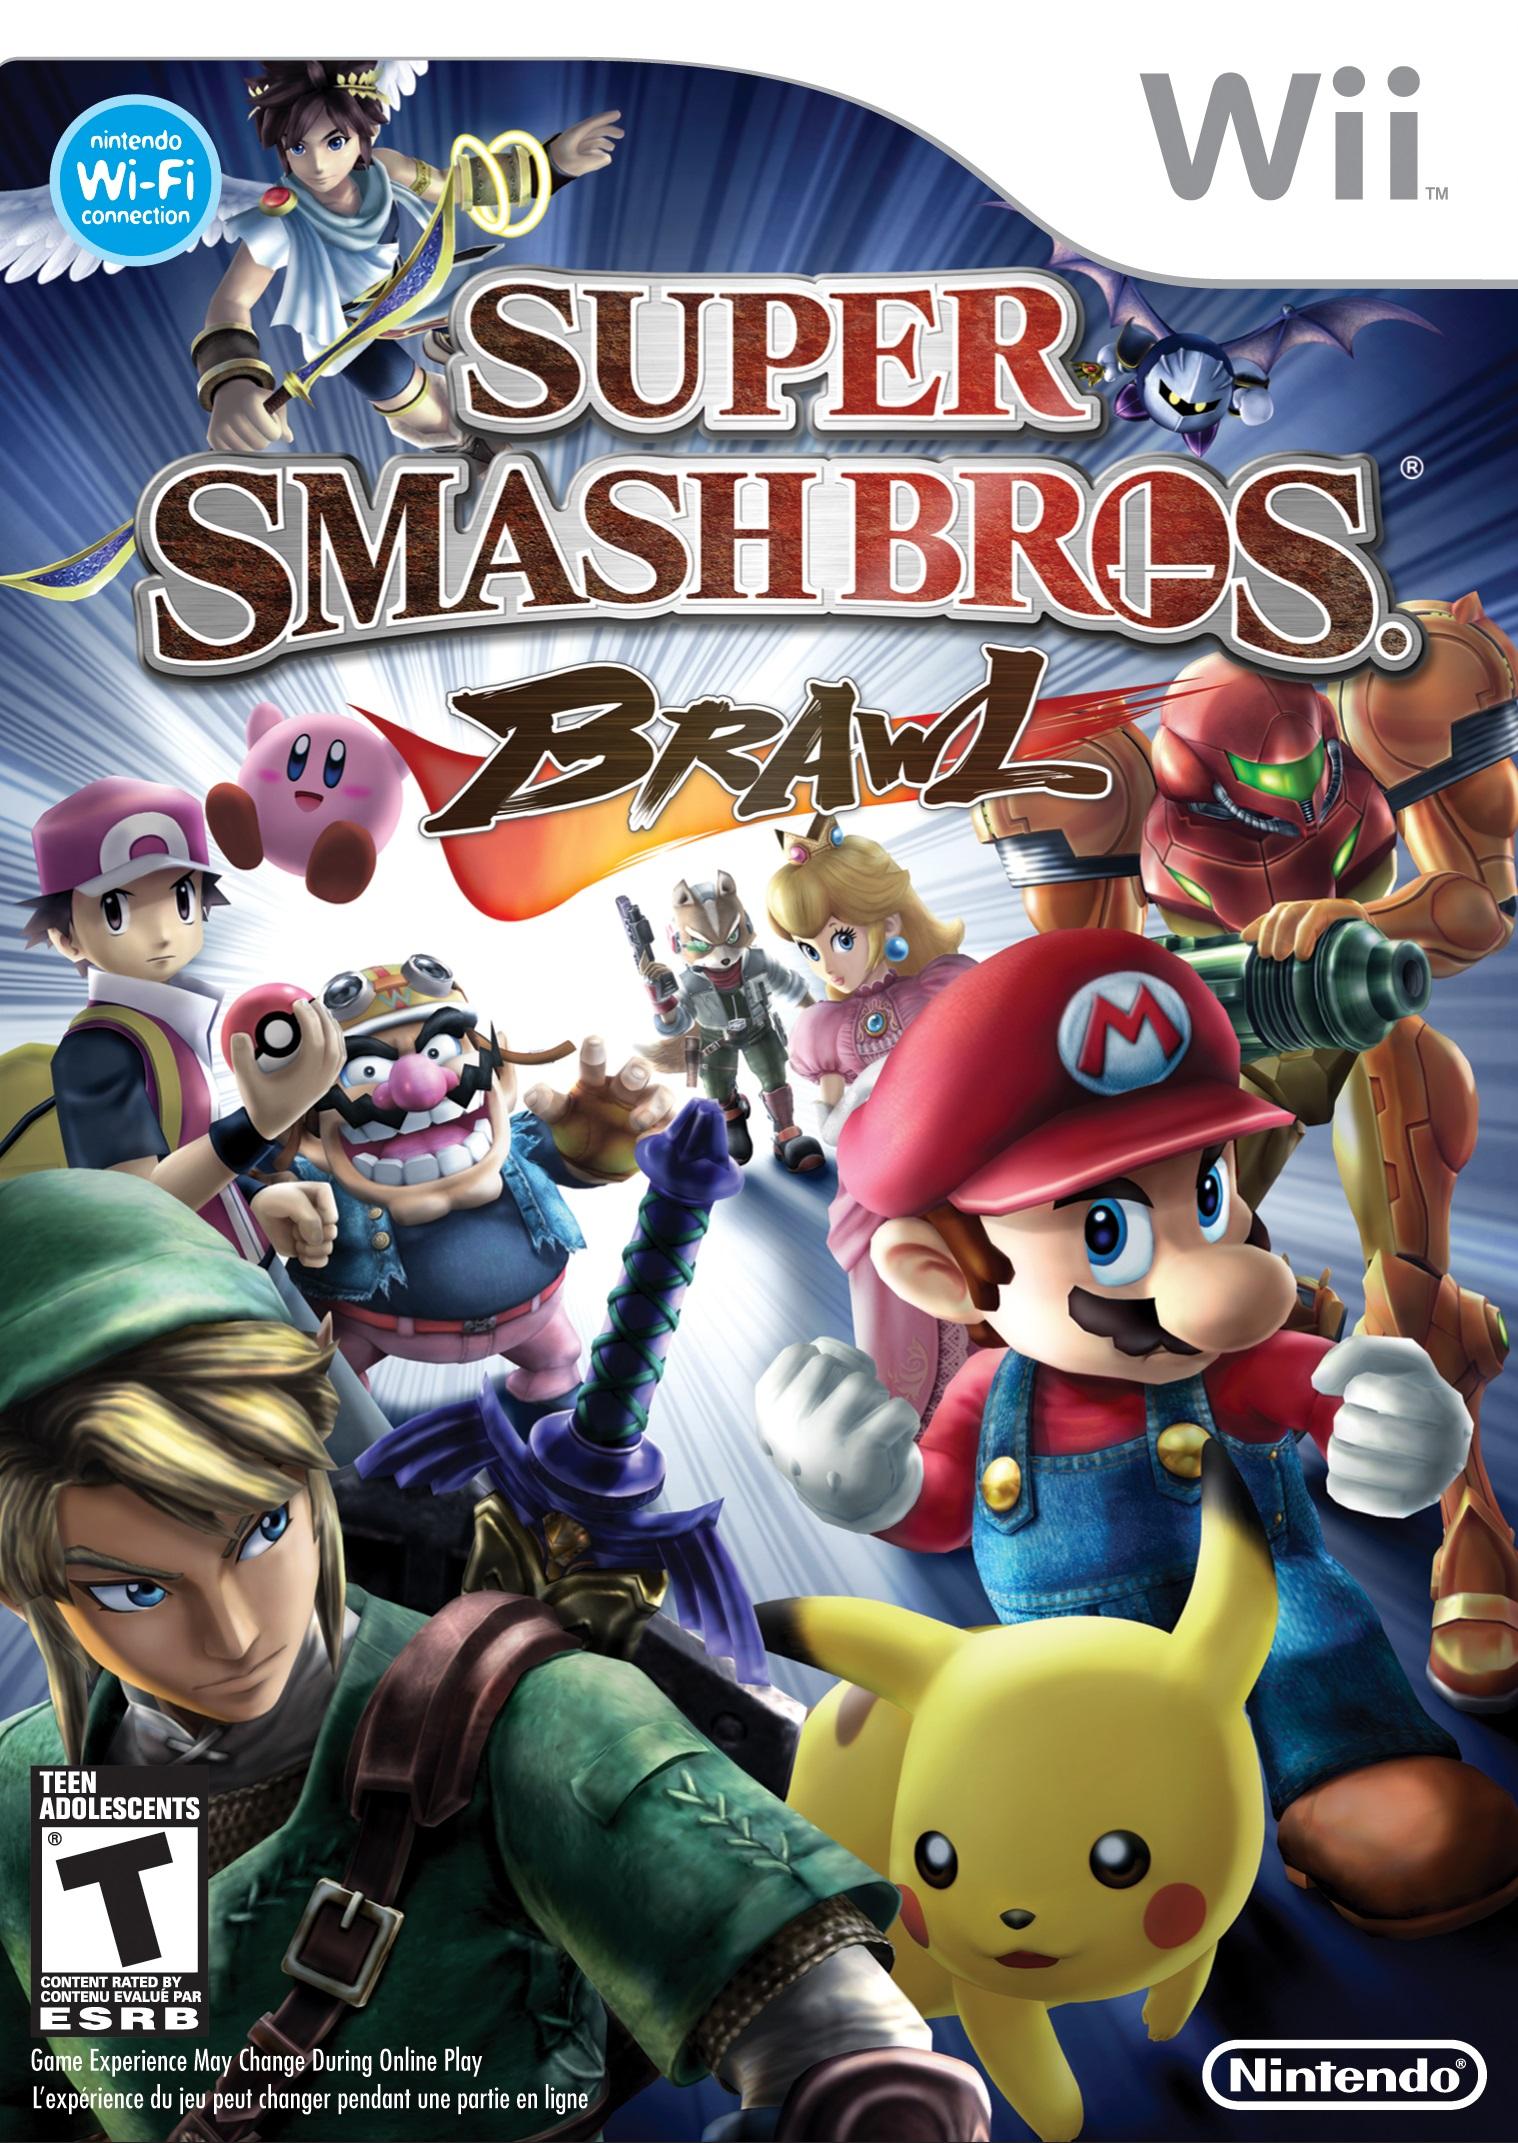 Chords for Luigi Circuit - Super Smash Bros. Brawl